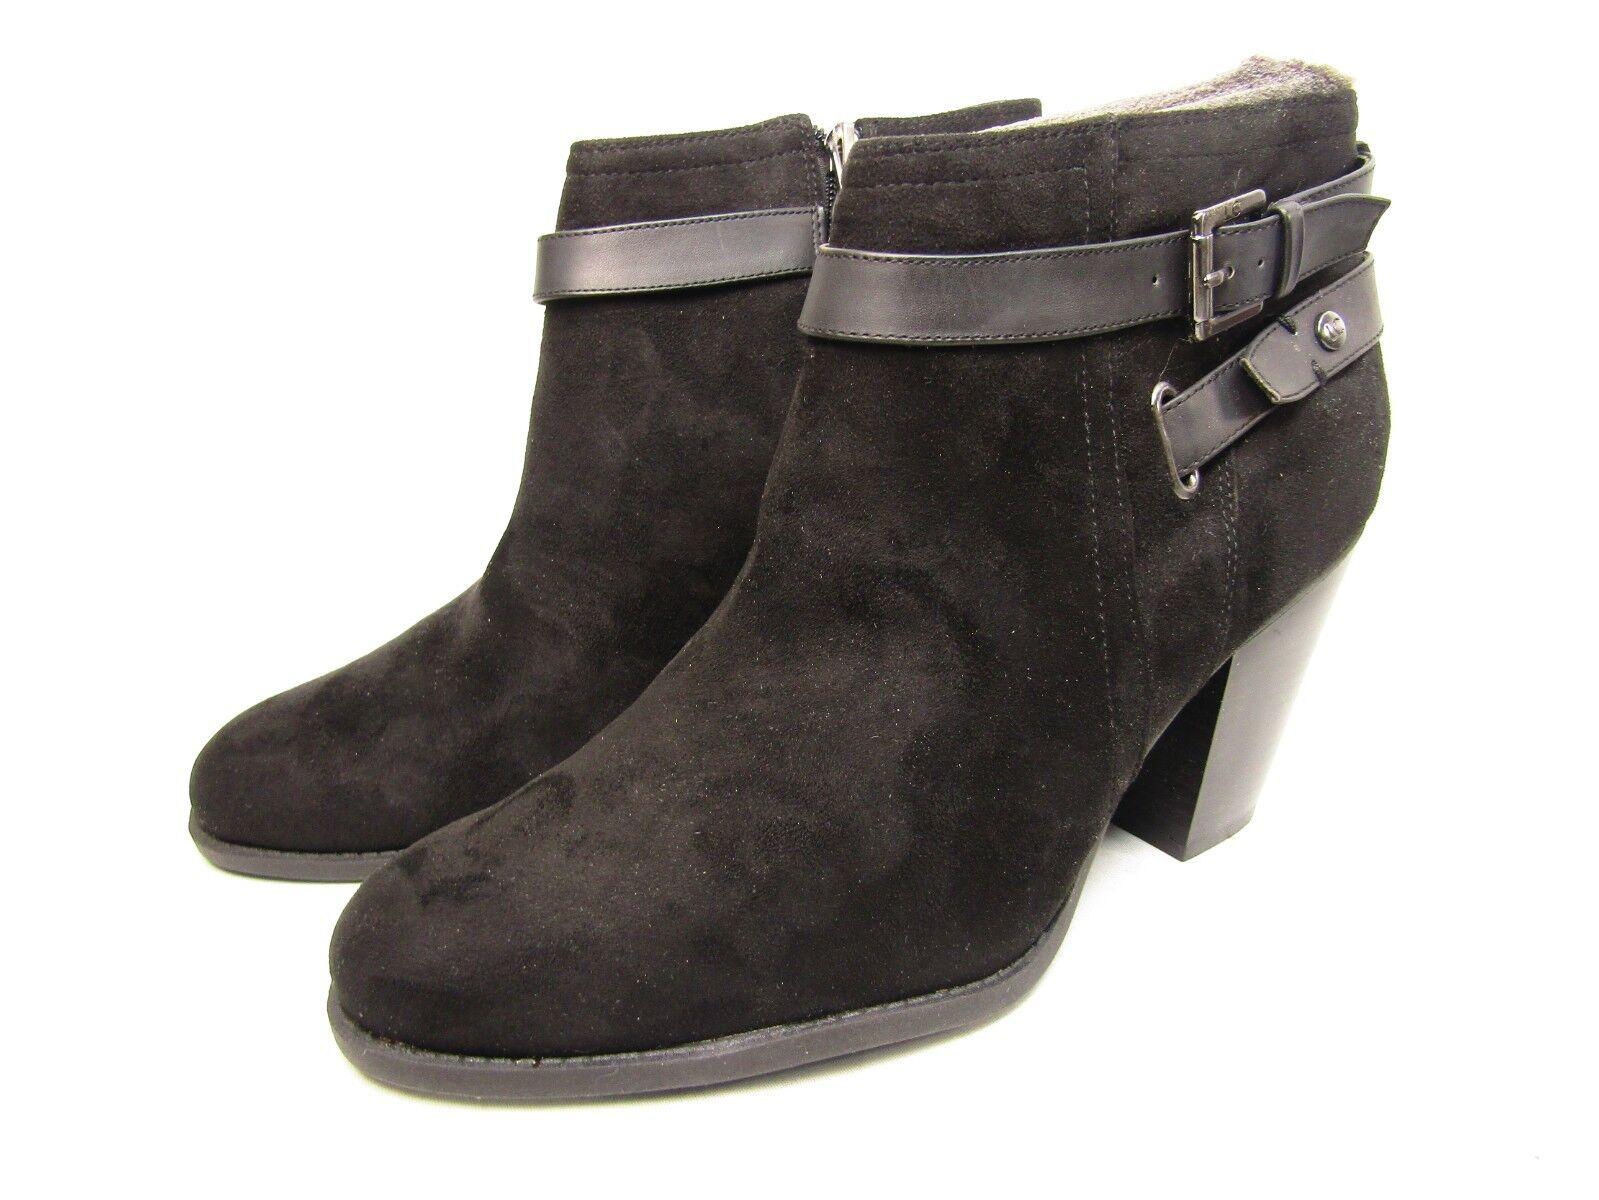 Liz claiborne Fawn Mujer botas botas botas al Tobillo Cremallera Lateral Talla Negro 11W  comprar barato